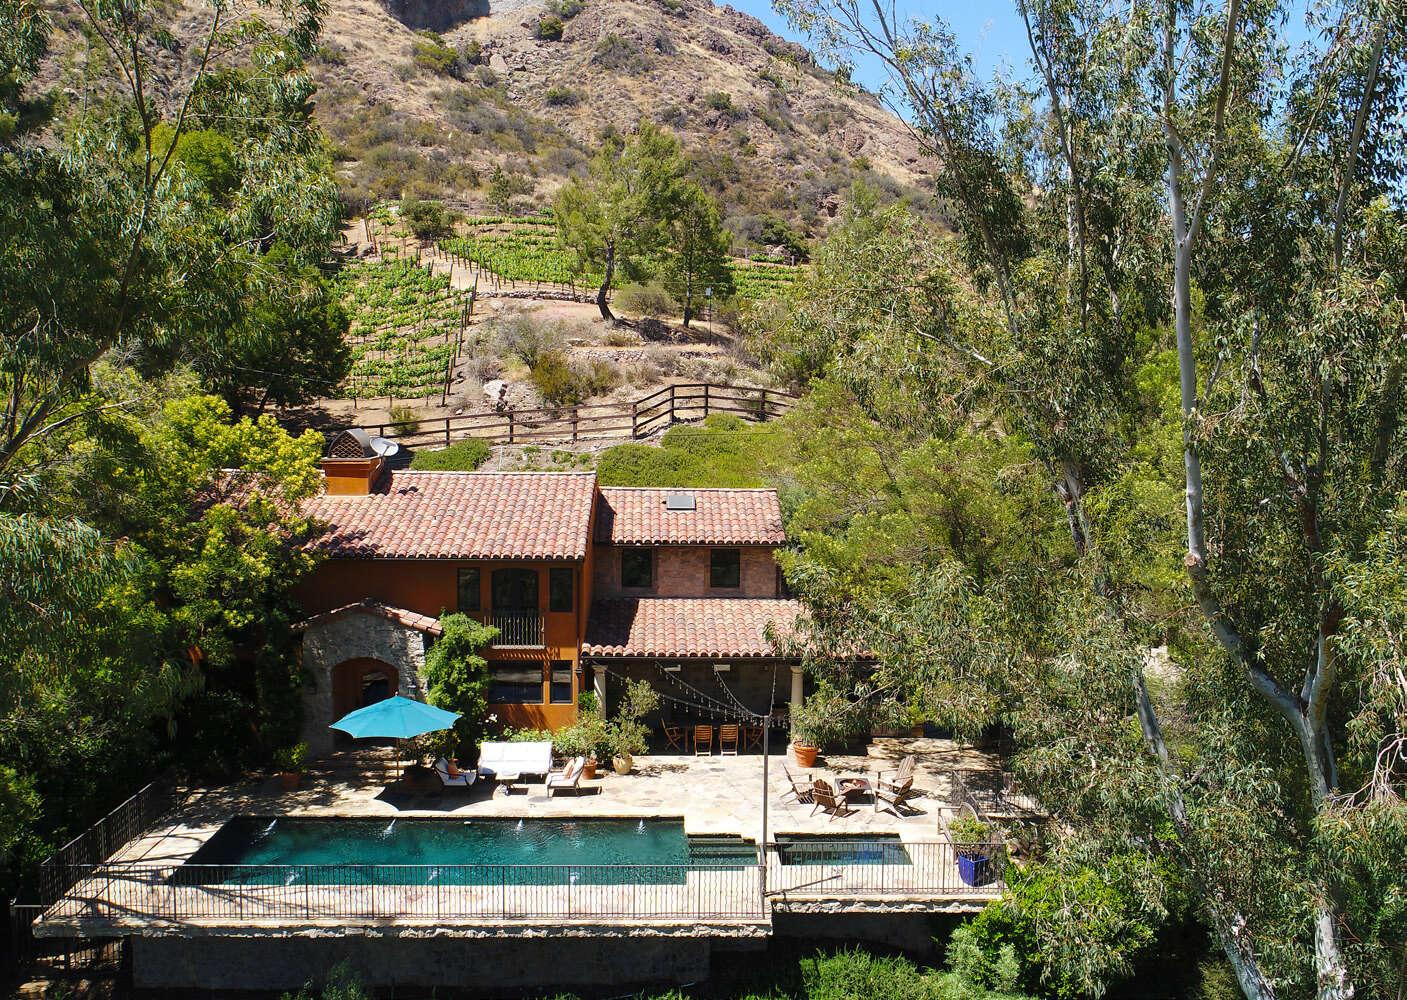 Single Family for Sale at 31145 Lobo Vista Drive Agoura, California 91301 United States